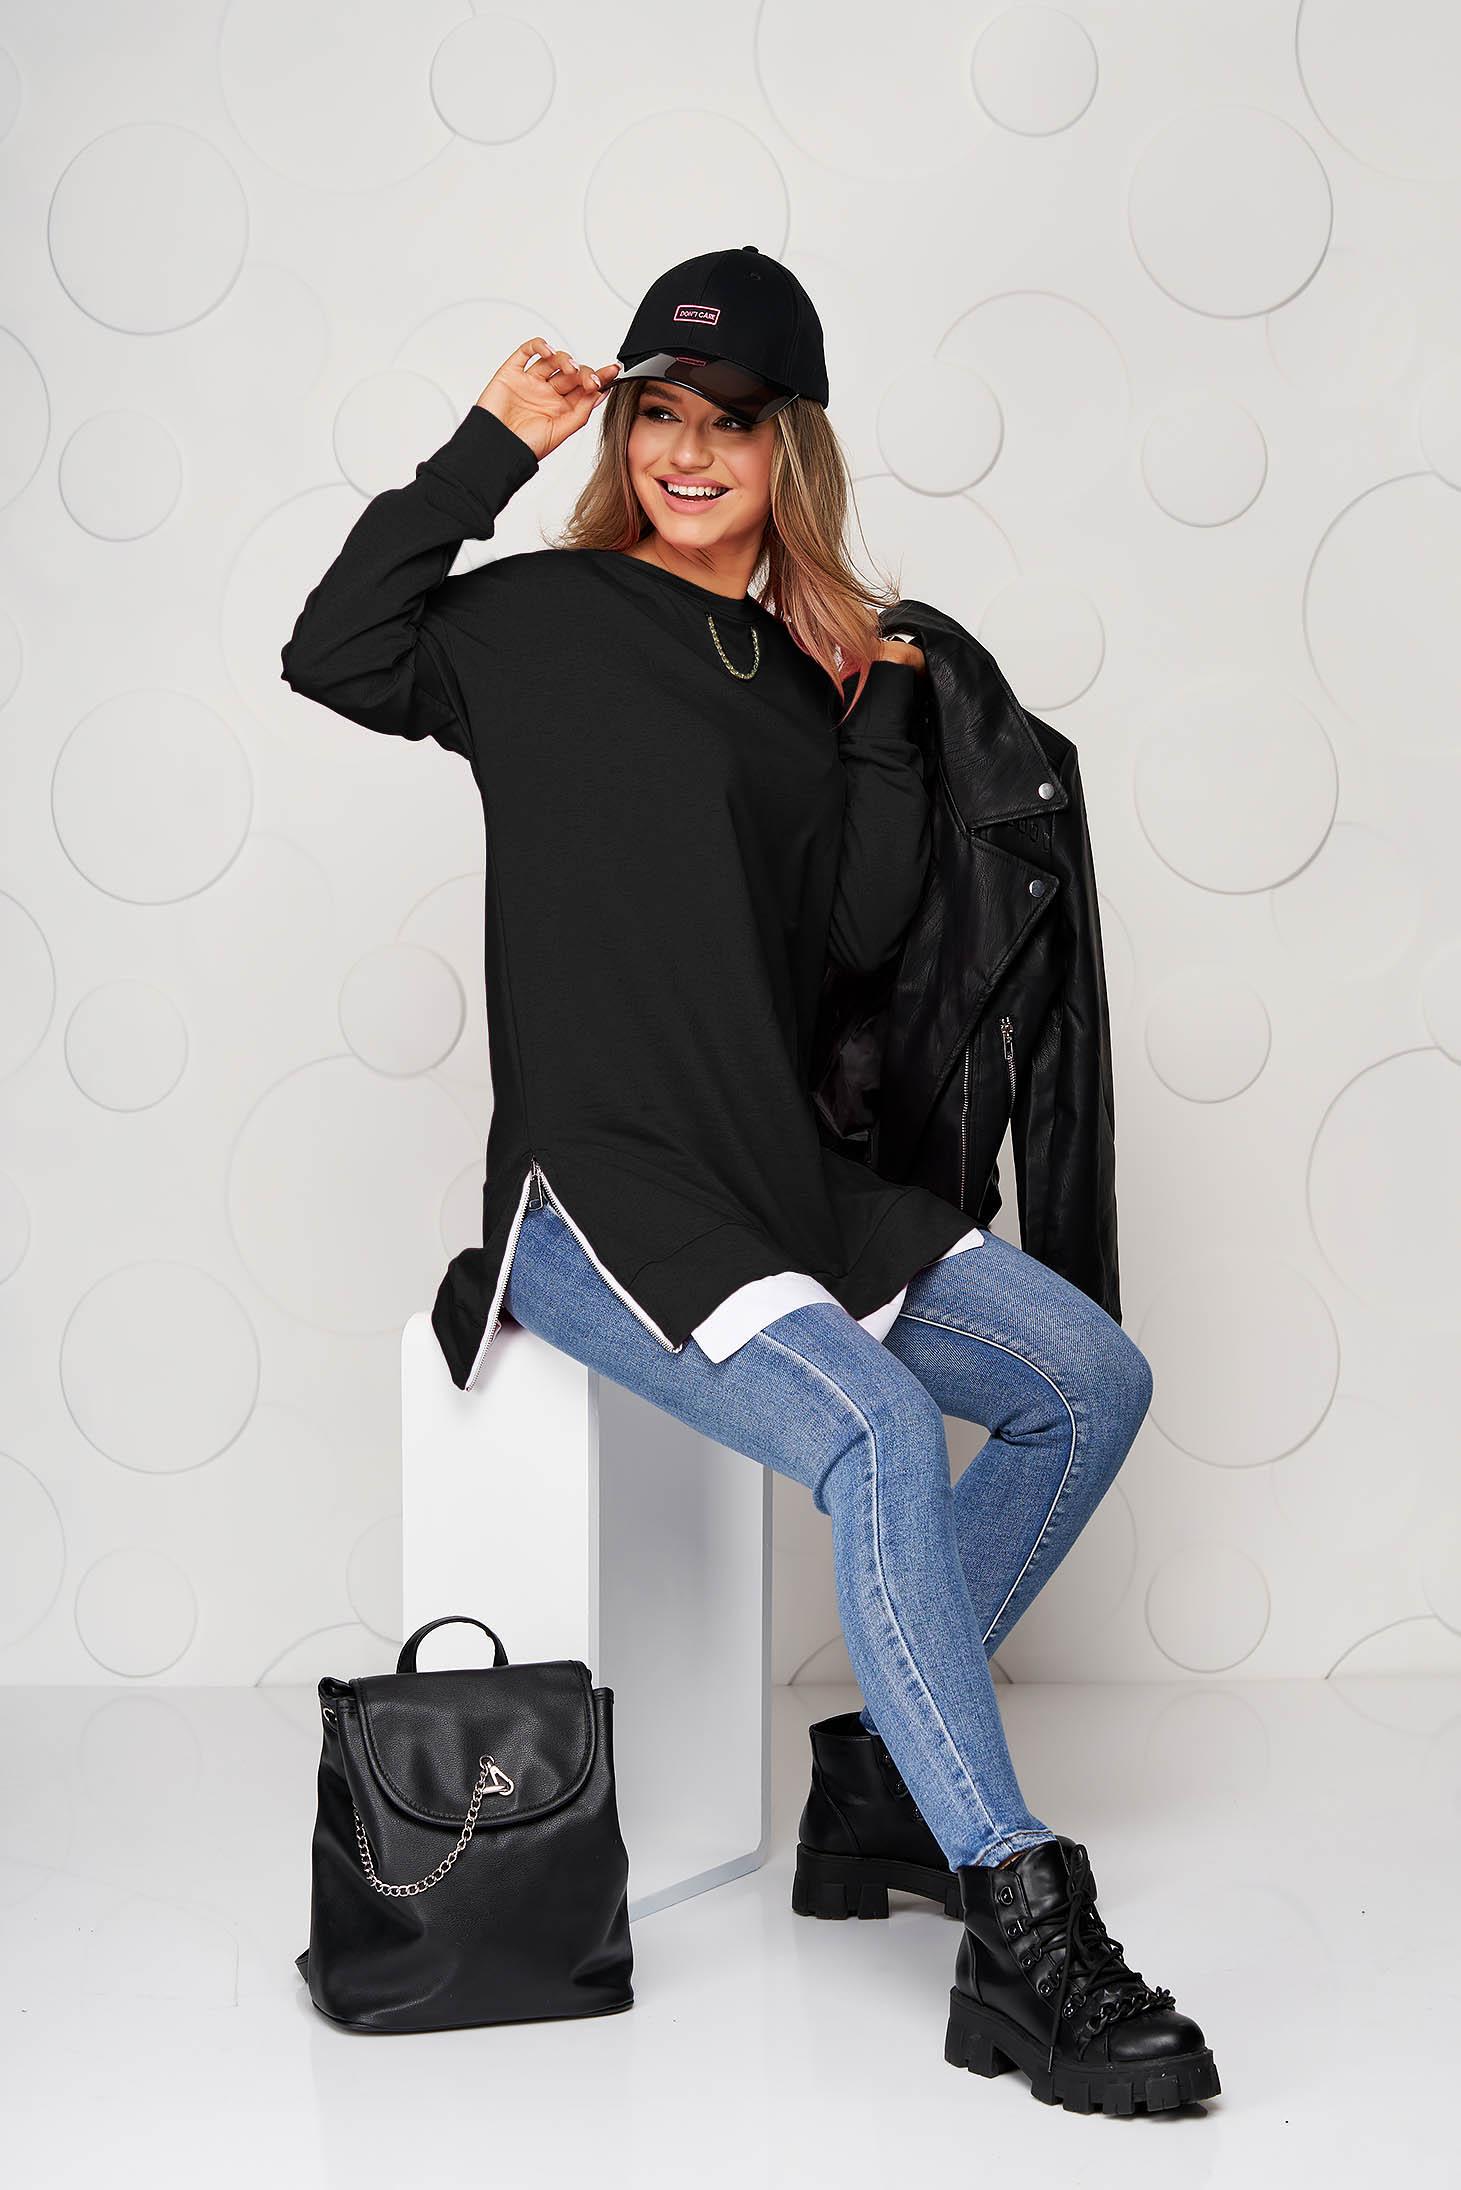 Bluza dama SunShine neagra din material usor elastic cu croi larg accesorizata cu lant metalic